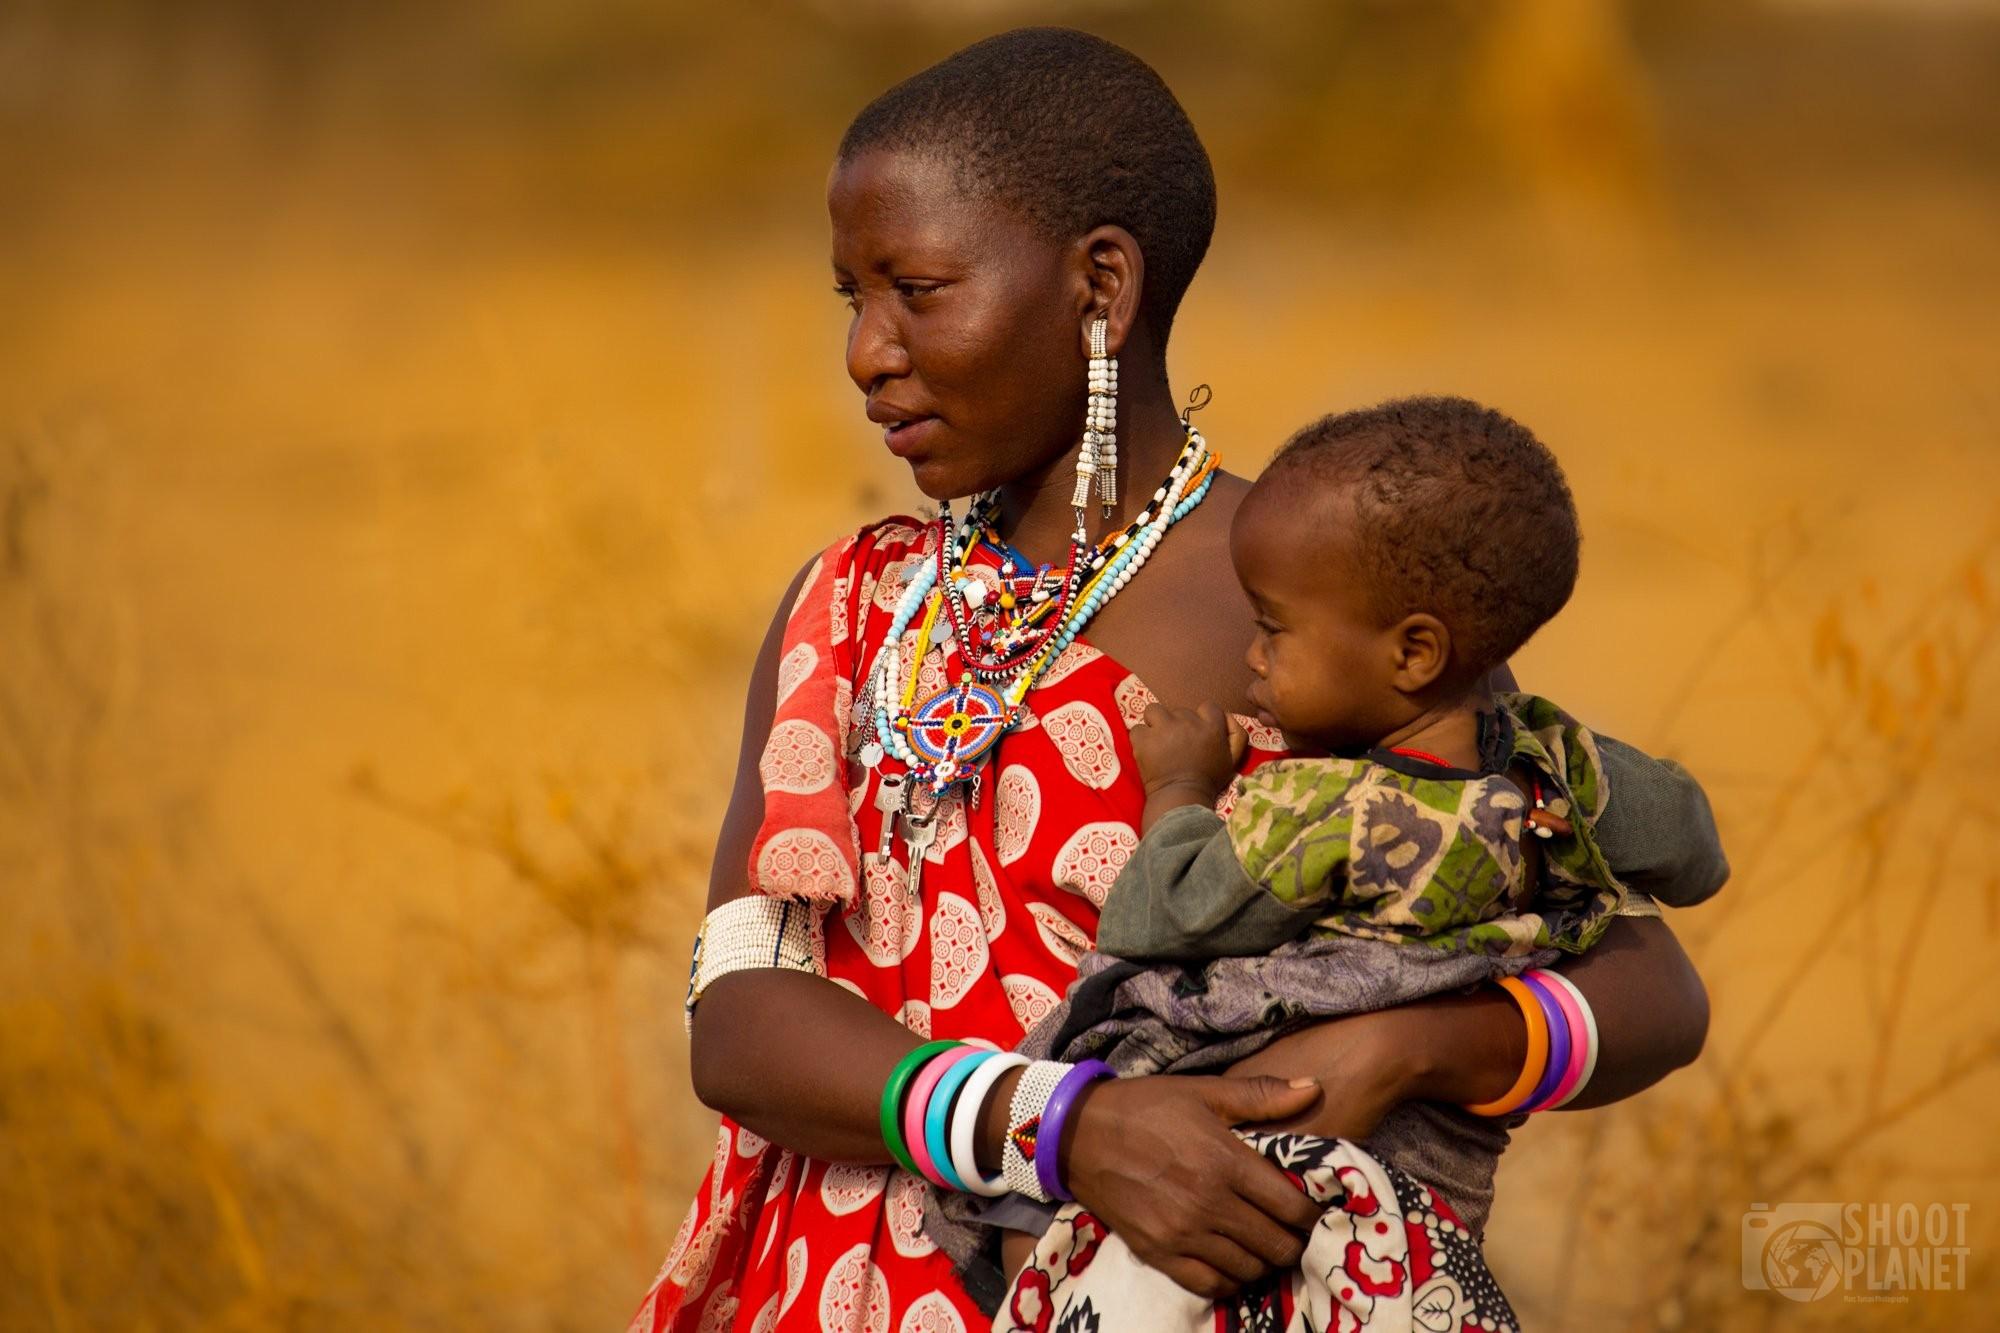 Masai mom and kid, Tanzania